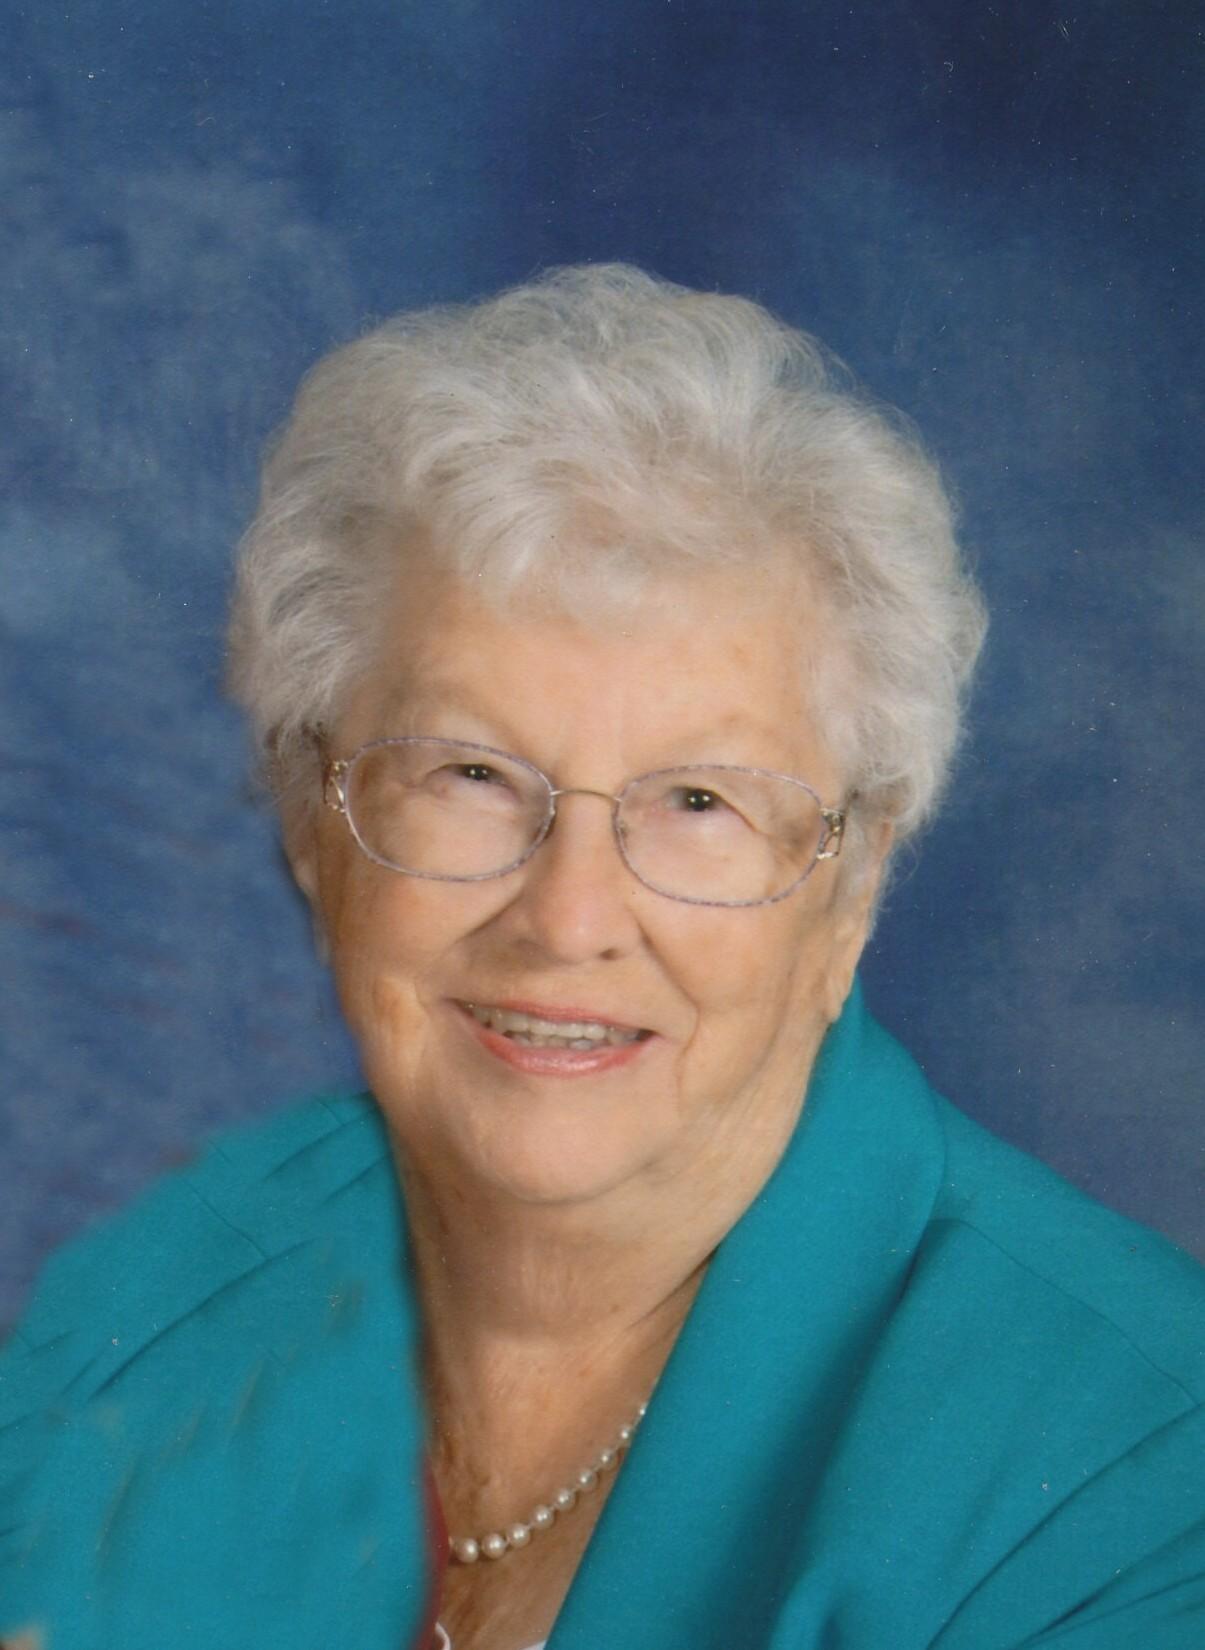 Doris (Mrs. Harlan) Kuester, age 79. of Stanton, Nebraska